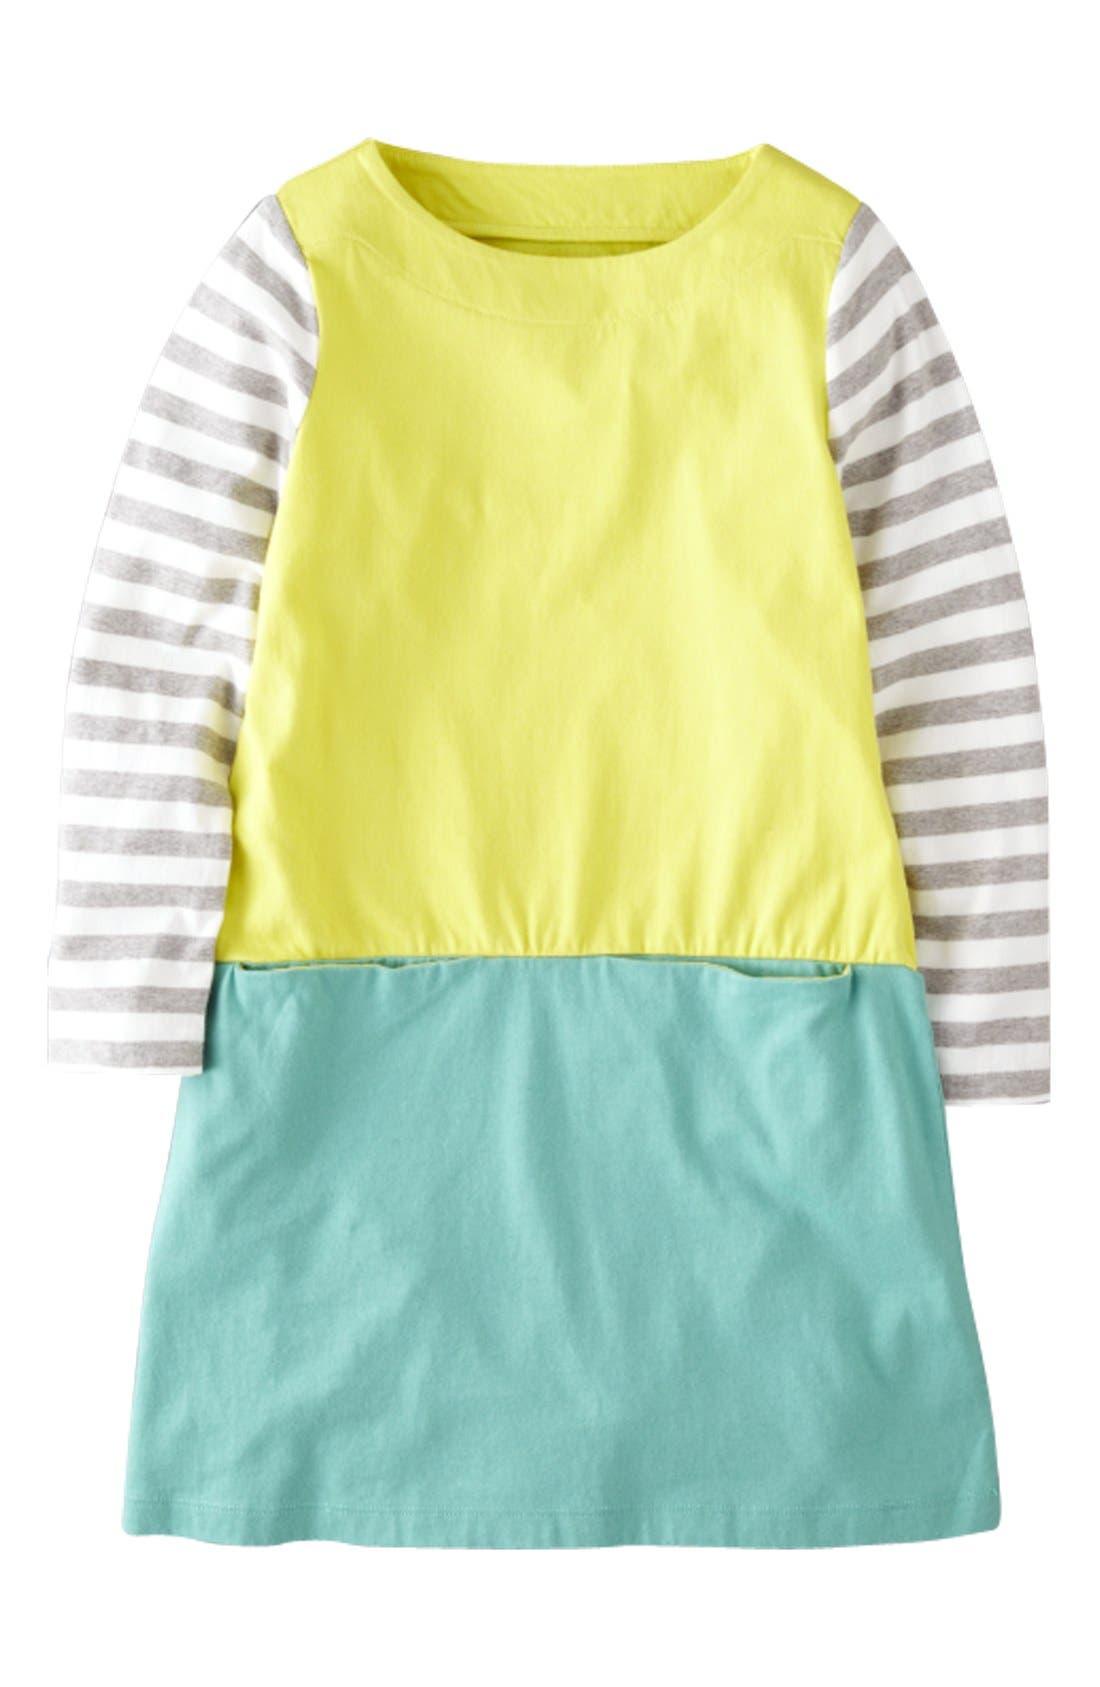 Main Image - Mini Boden 'Hotchpotch' Jersey Dress (Little Girls & Big Girls)